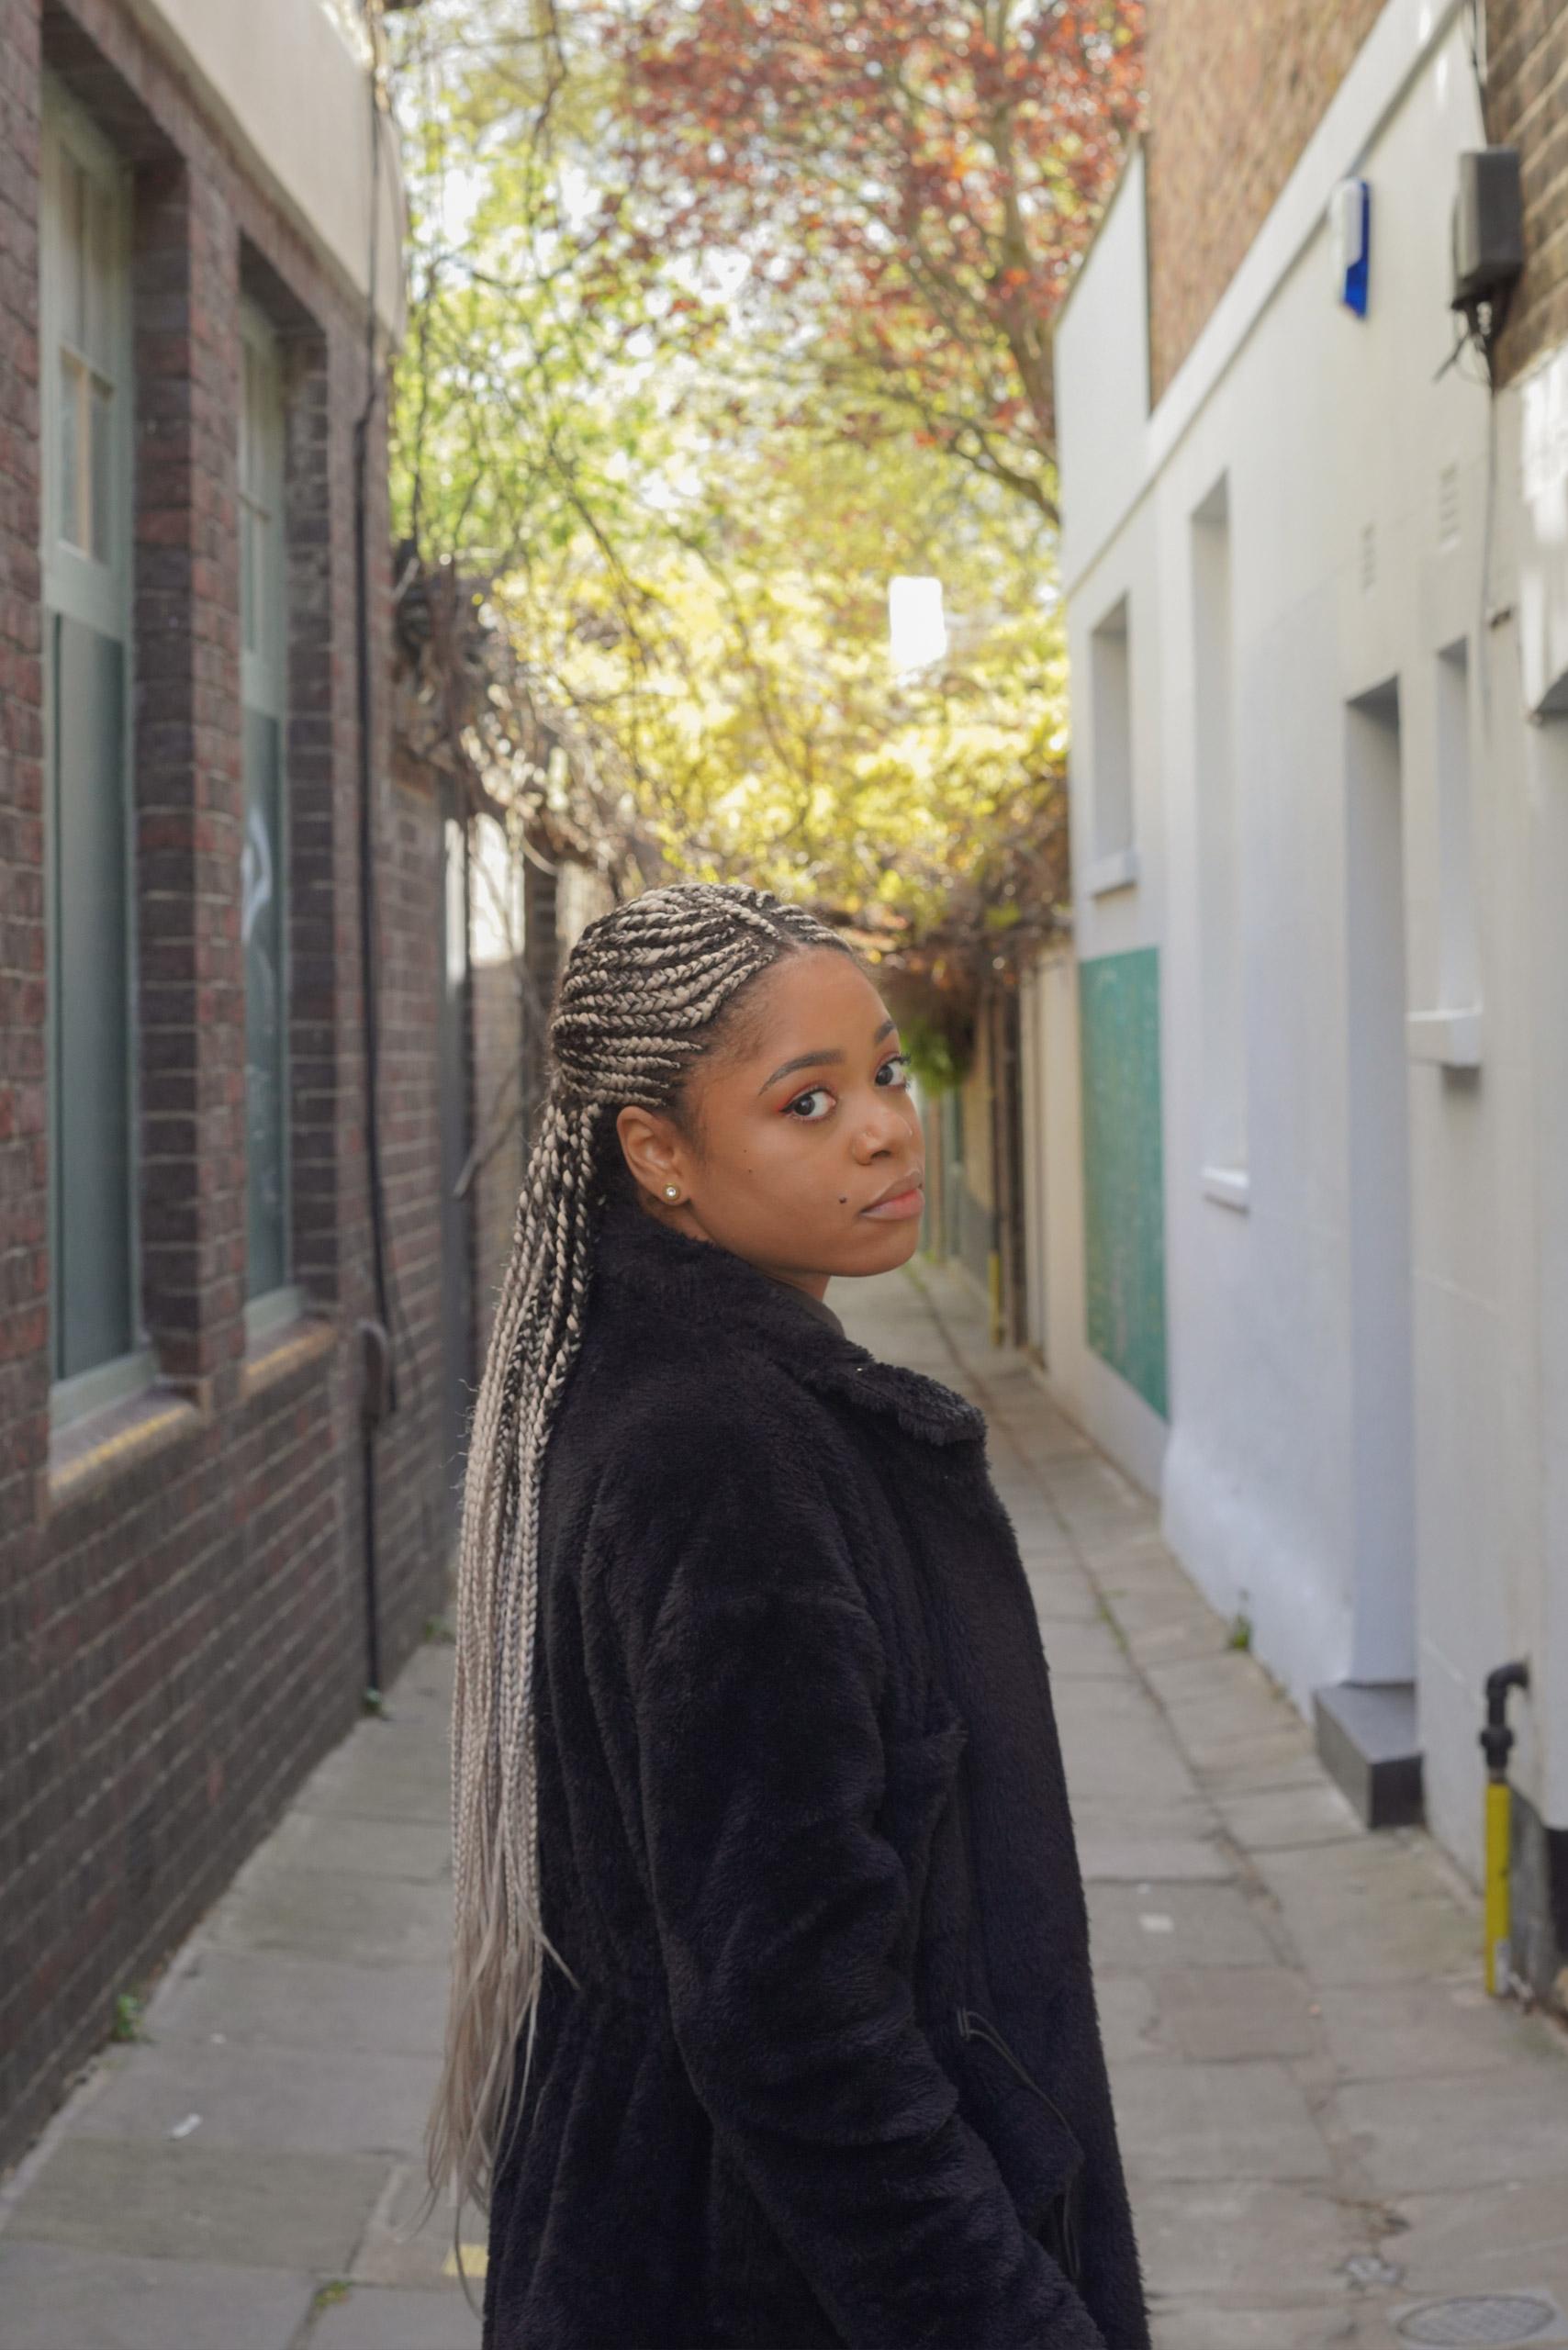 Lauren Marie Haywood in an sunny alleyway looking at the camera